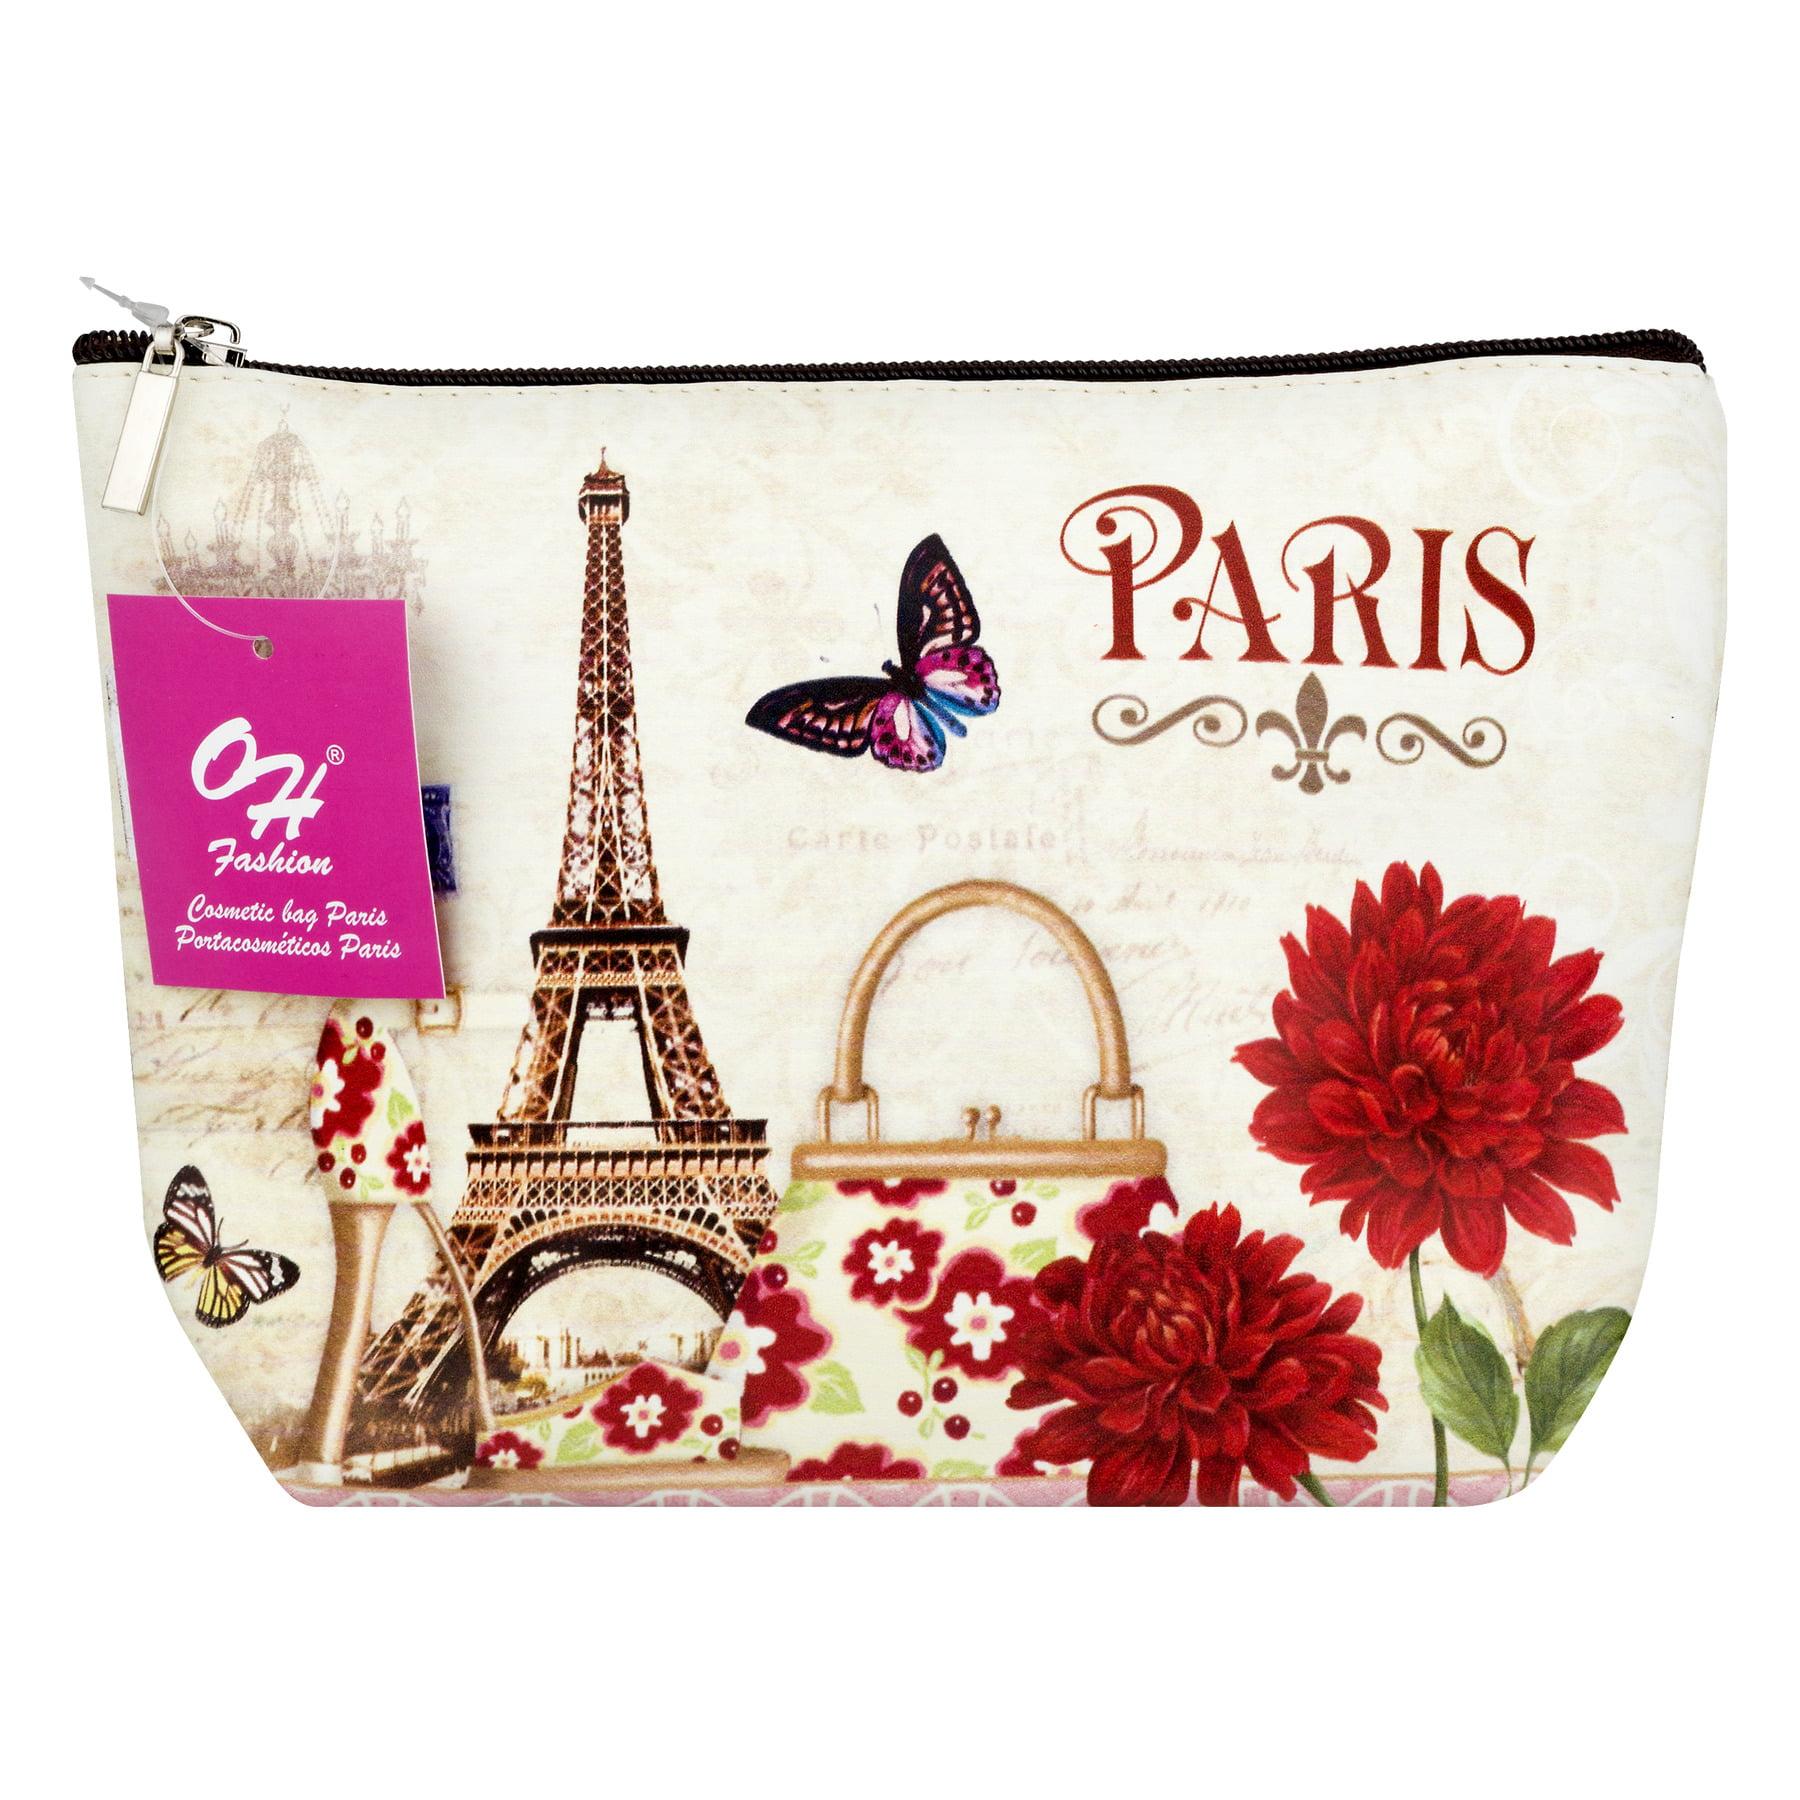 OH Fashion Cosmetic Bag, Paris, 1.0 CT